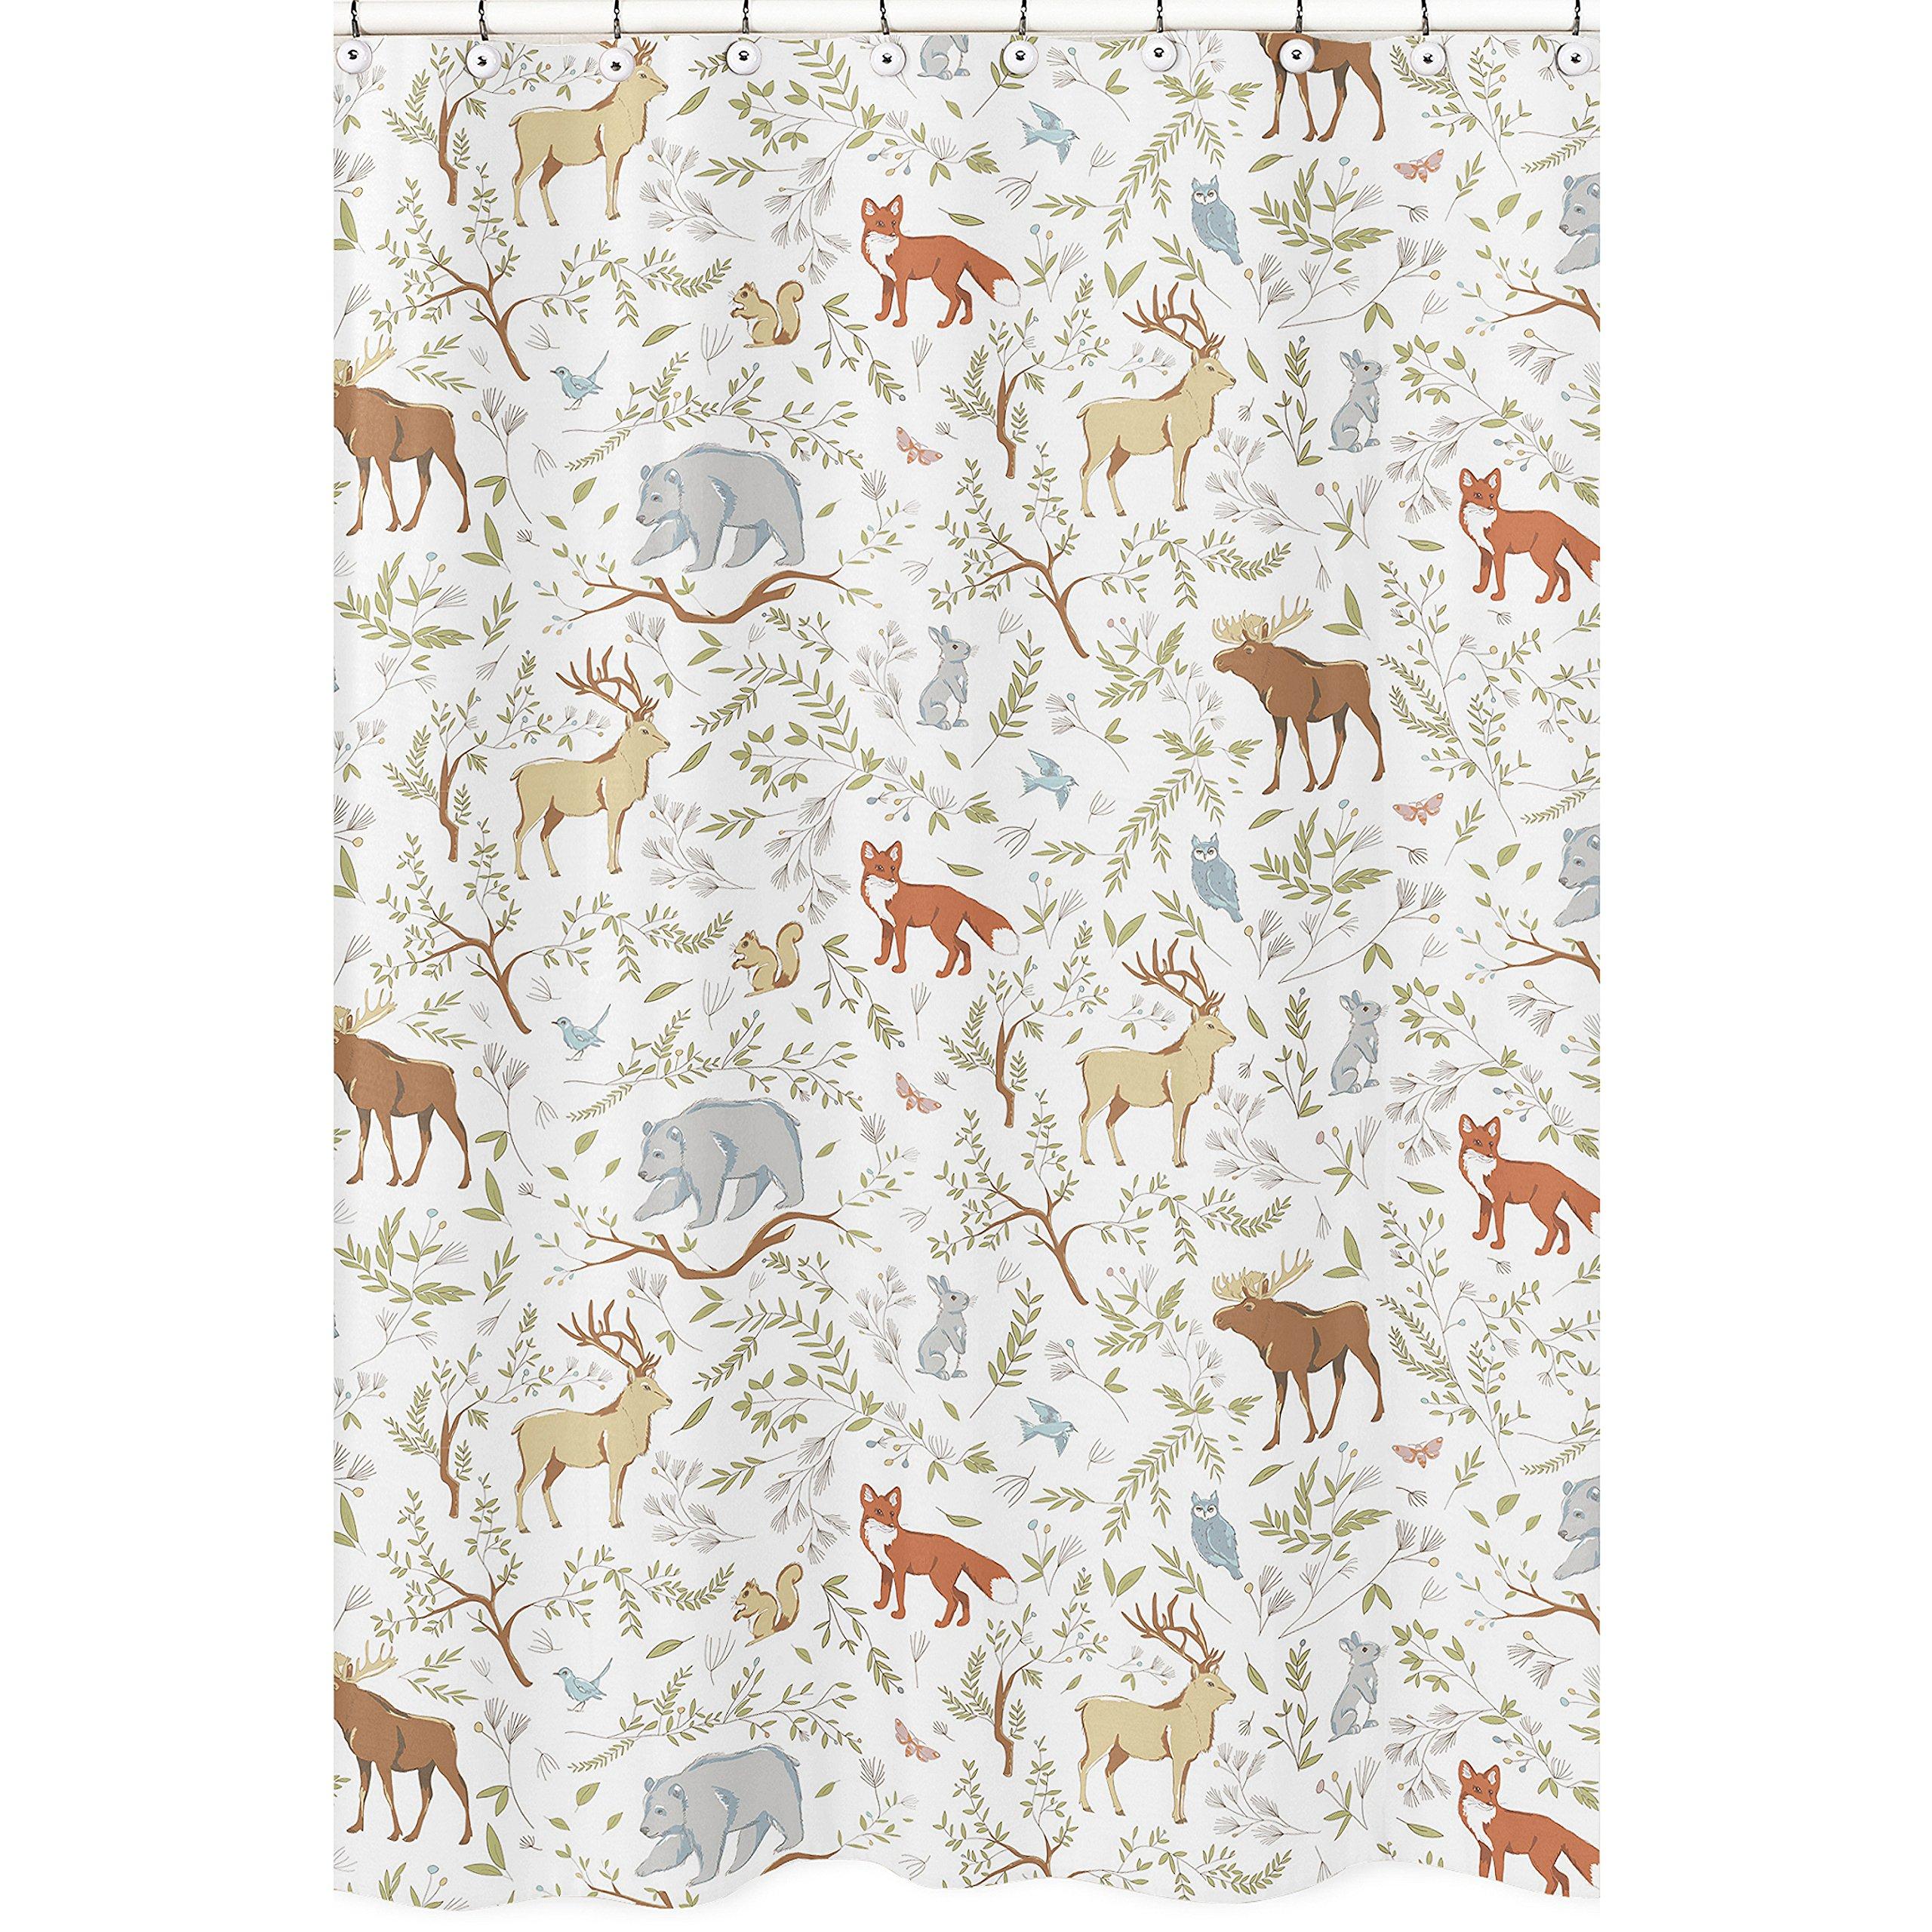 Sweet Jojo Designs Blue, Grey and White Woodland Deer Fox Bear Animal Toile Kids Bathroom Fabric Bath Shower Curtain